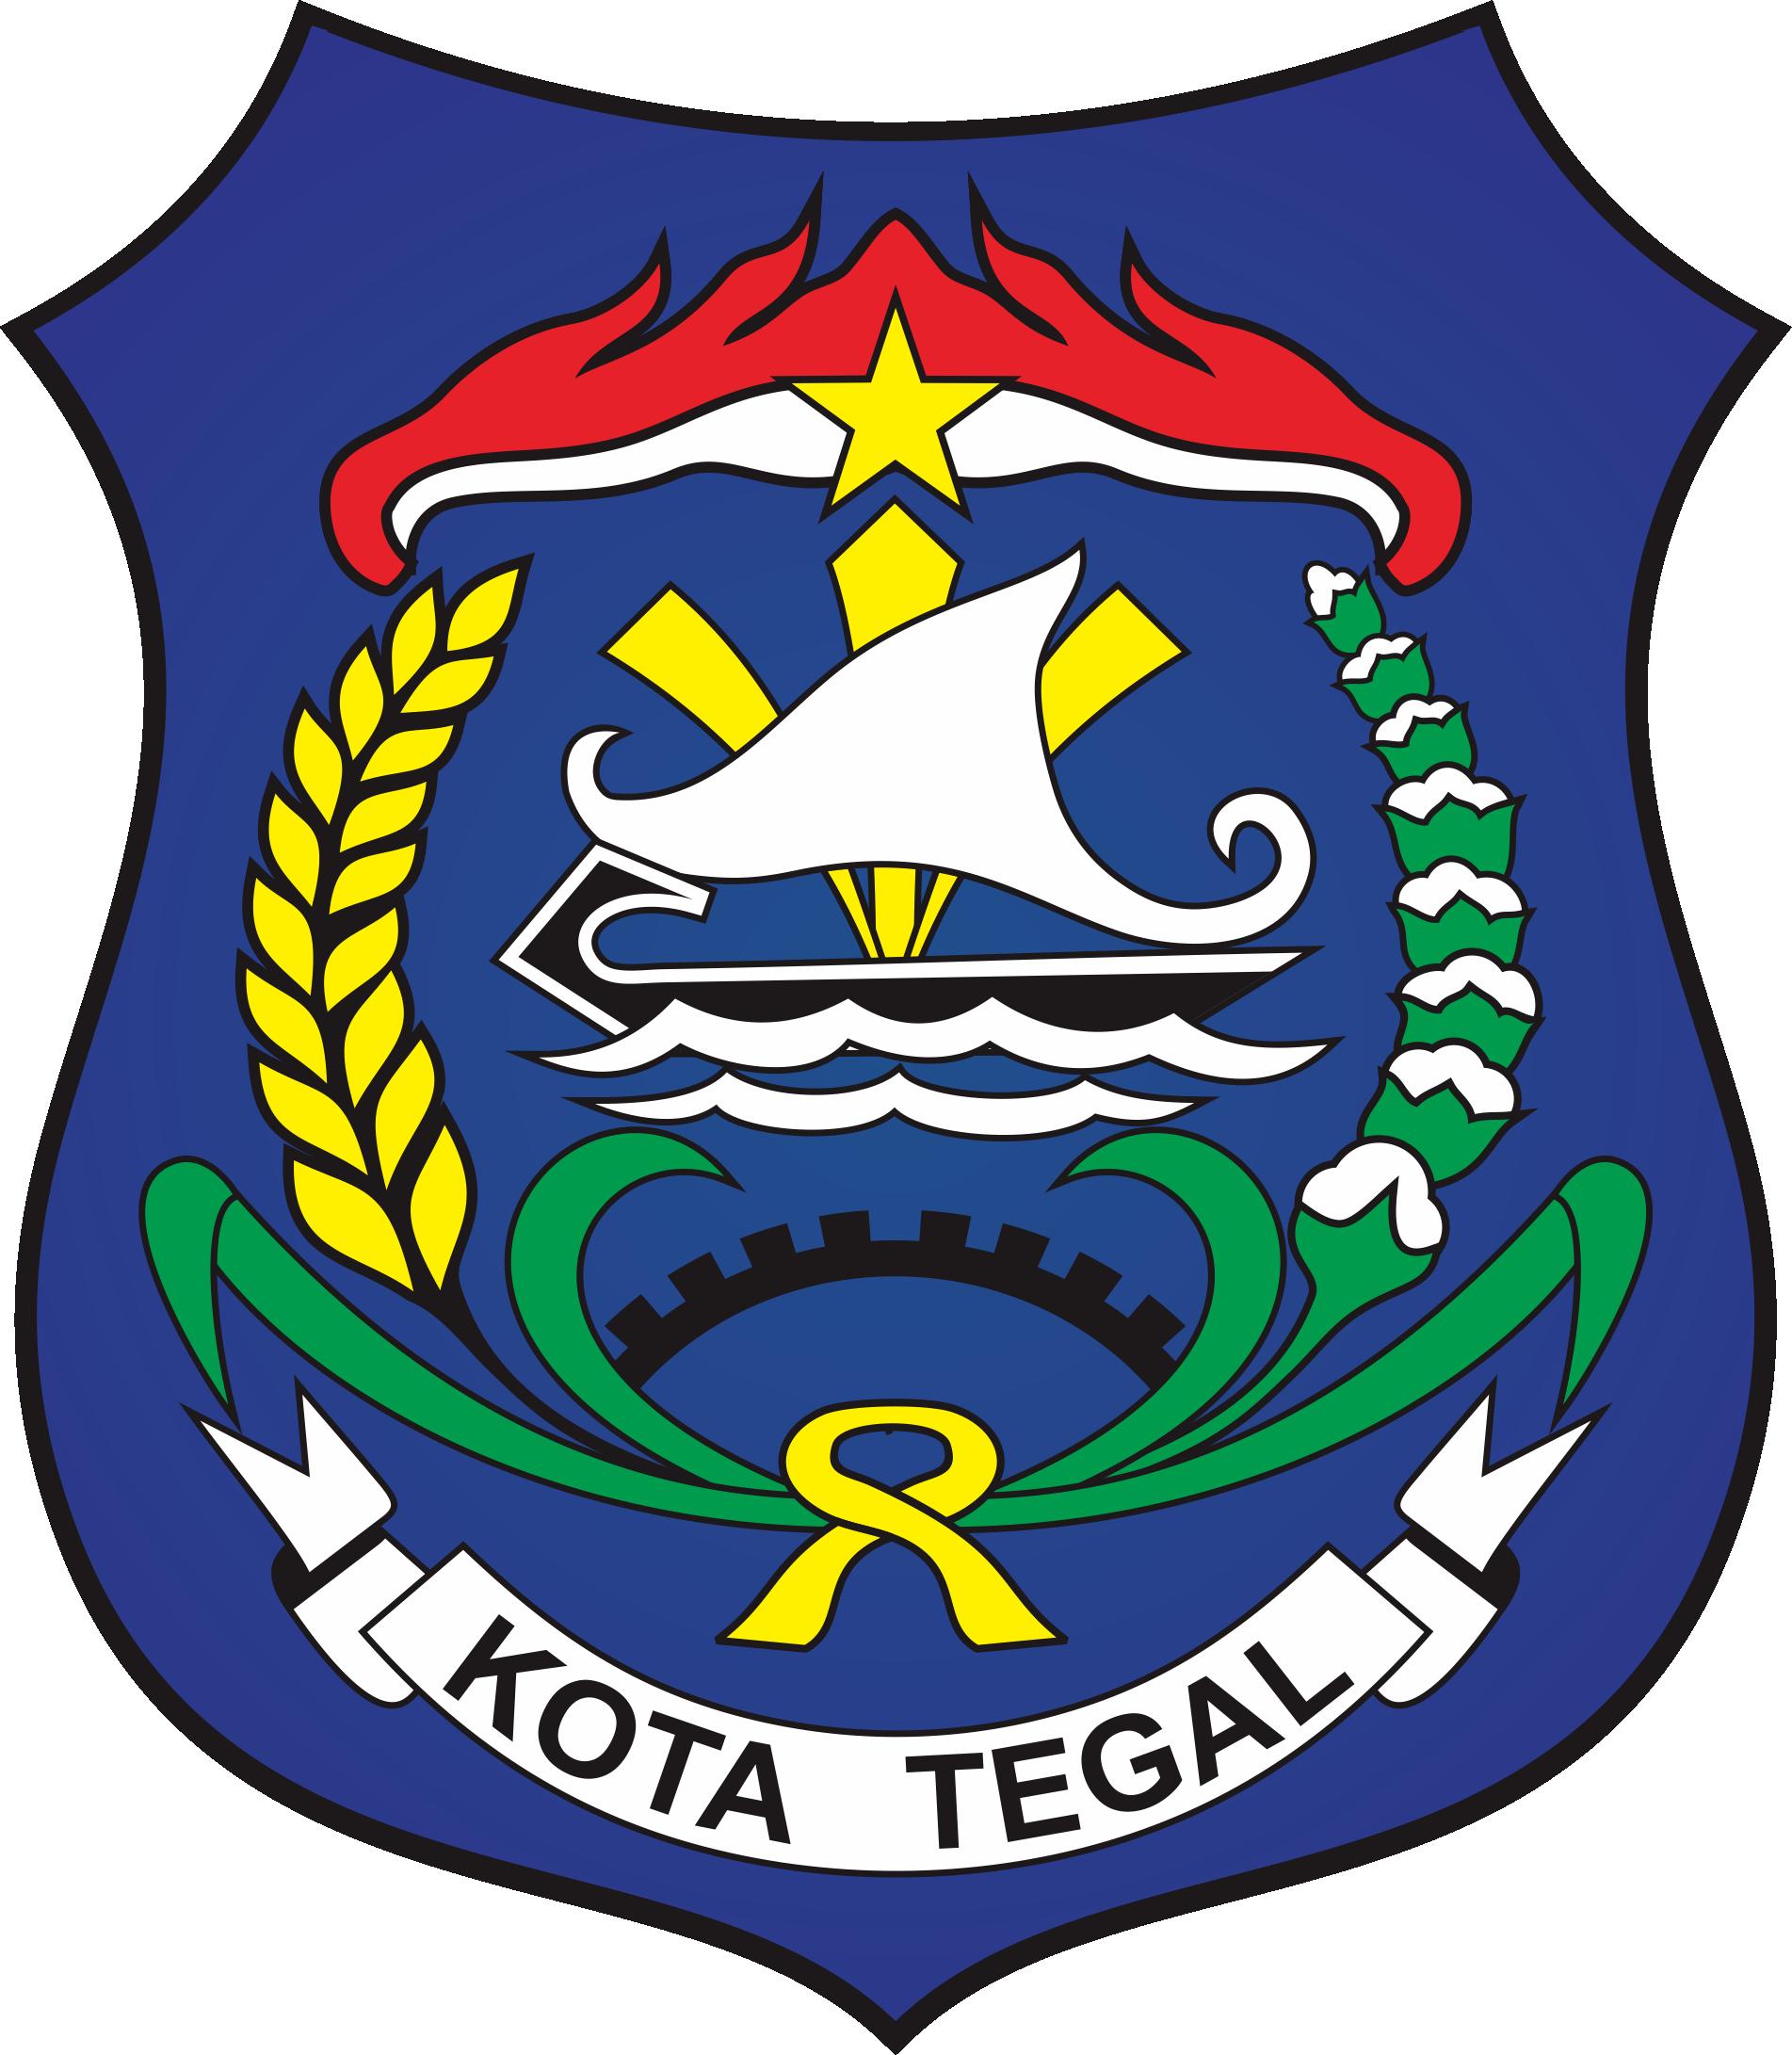 14 Kota Tegal Indonesia